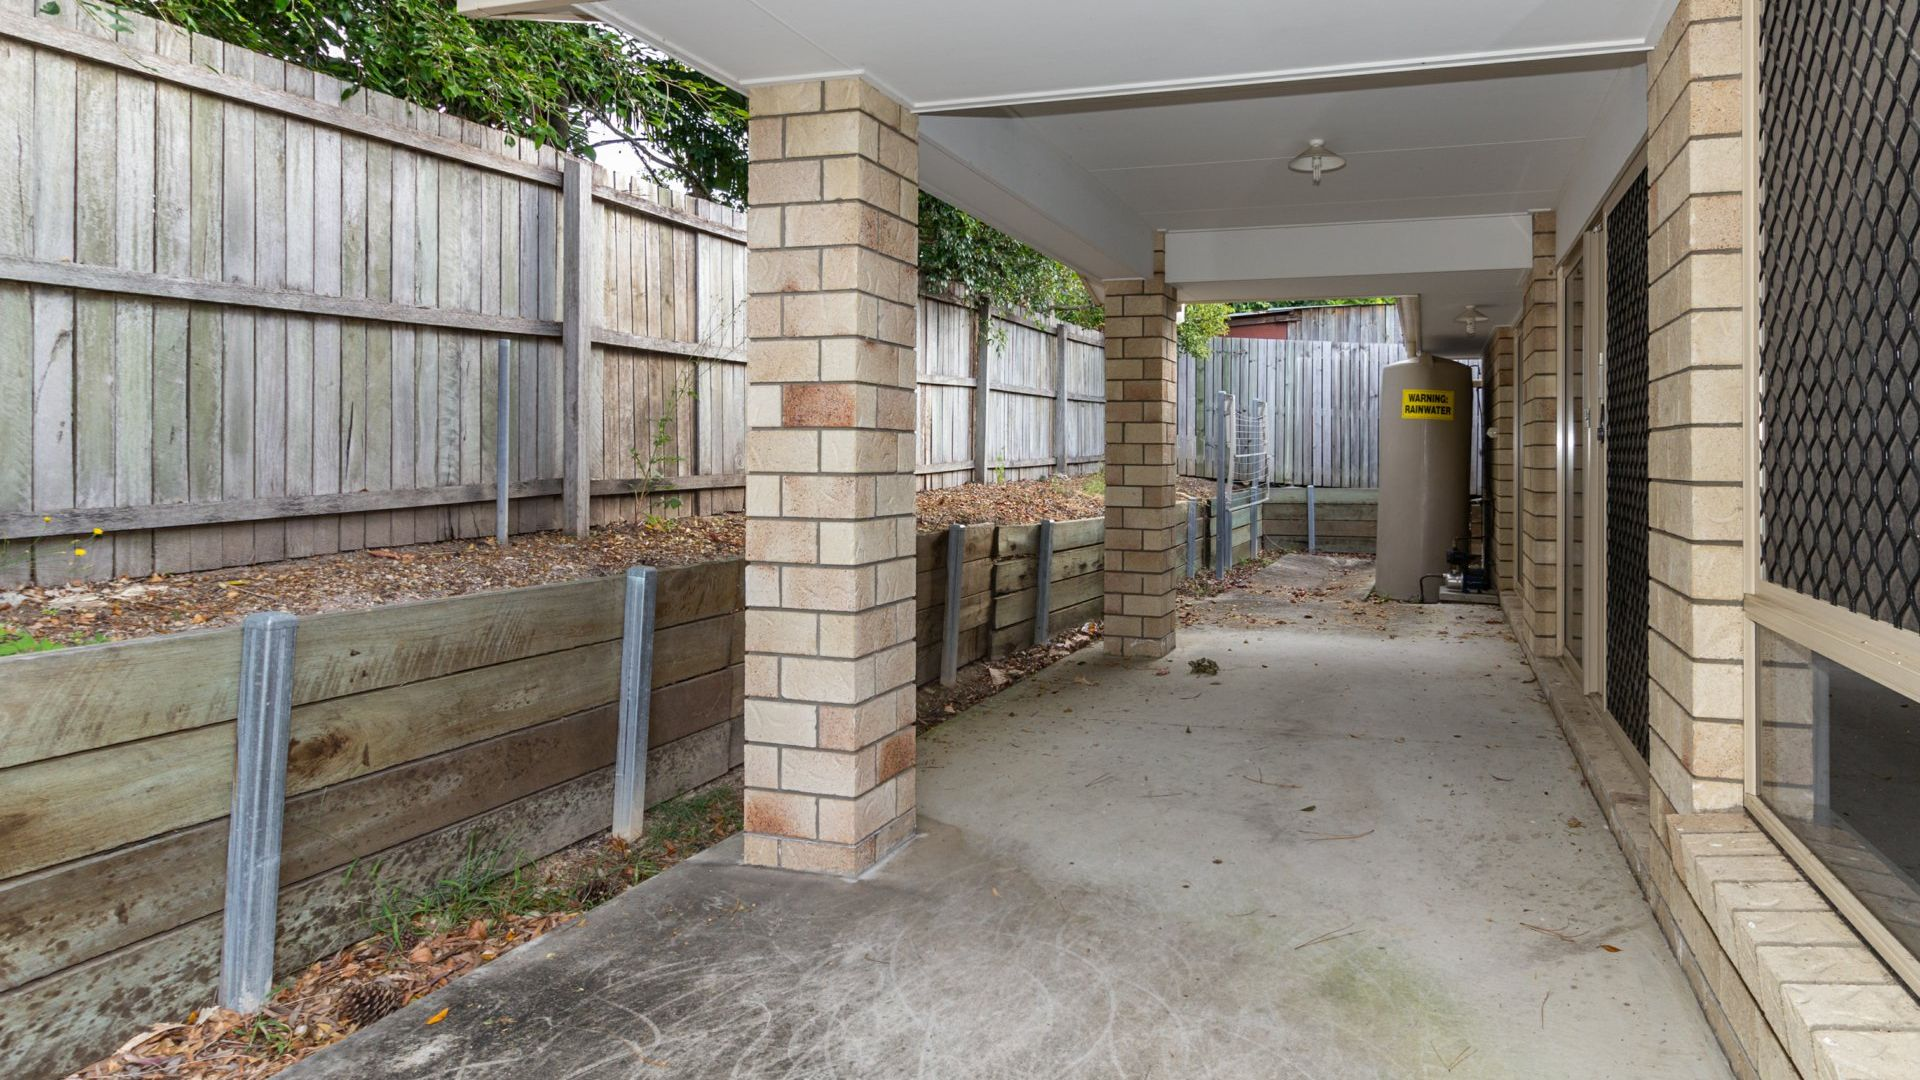 2/695 Browns Plains Road, Marsden QLD 4132, Image 1